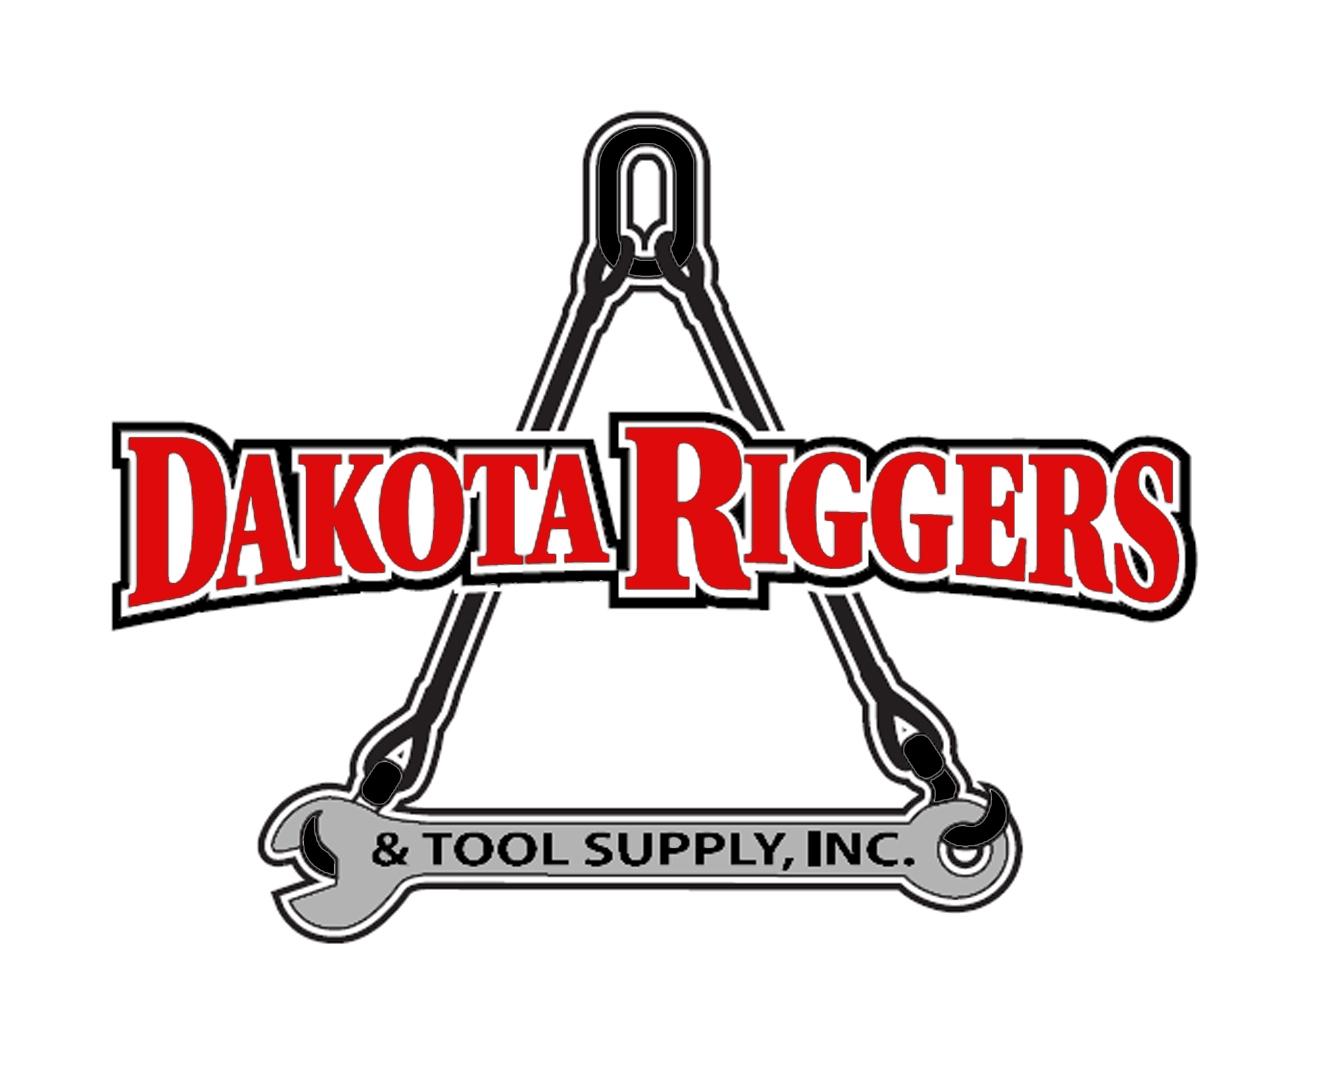 Dakota Riggers Logo 2009